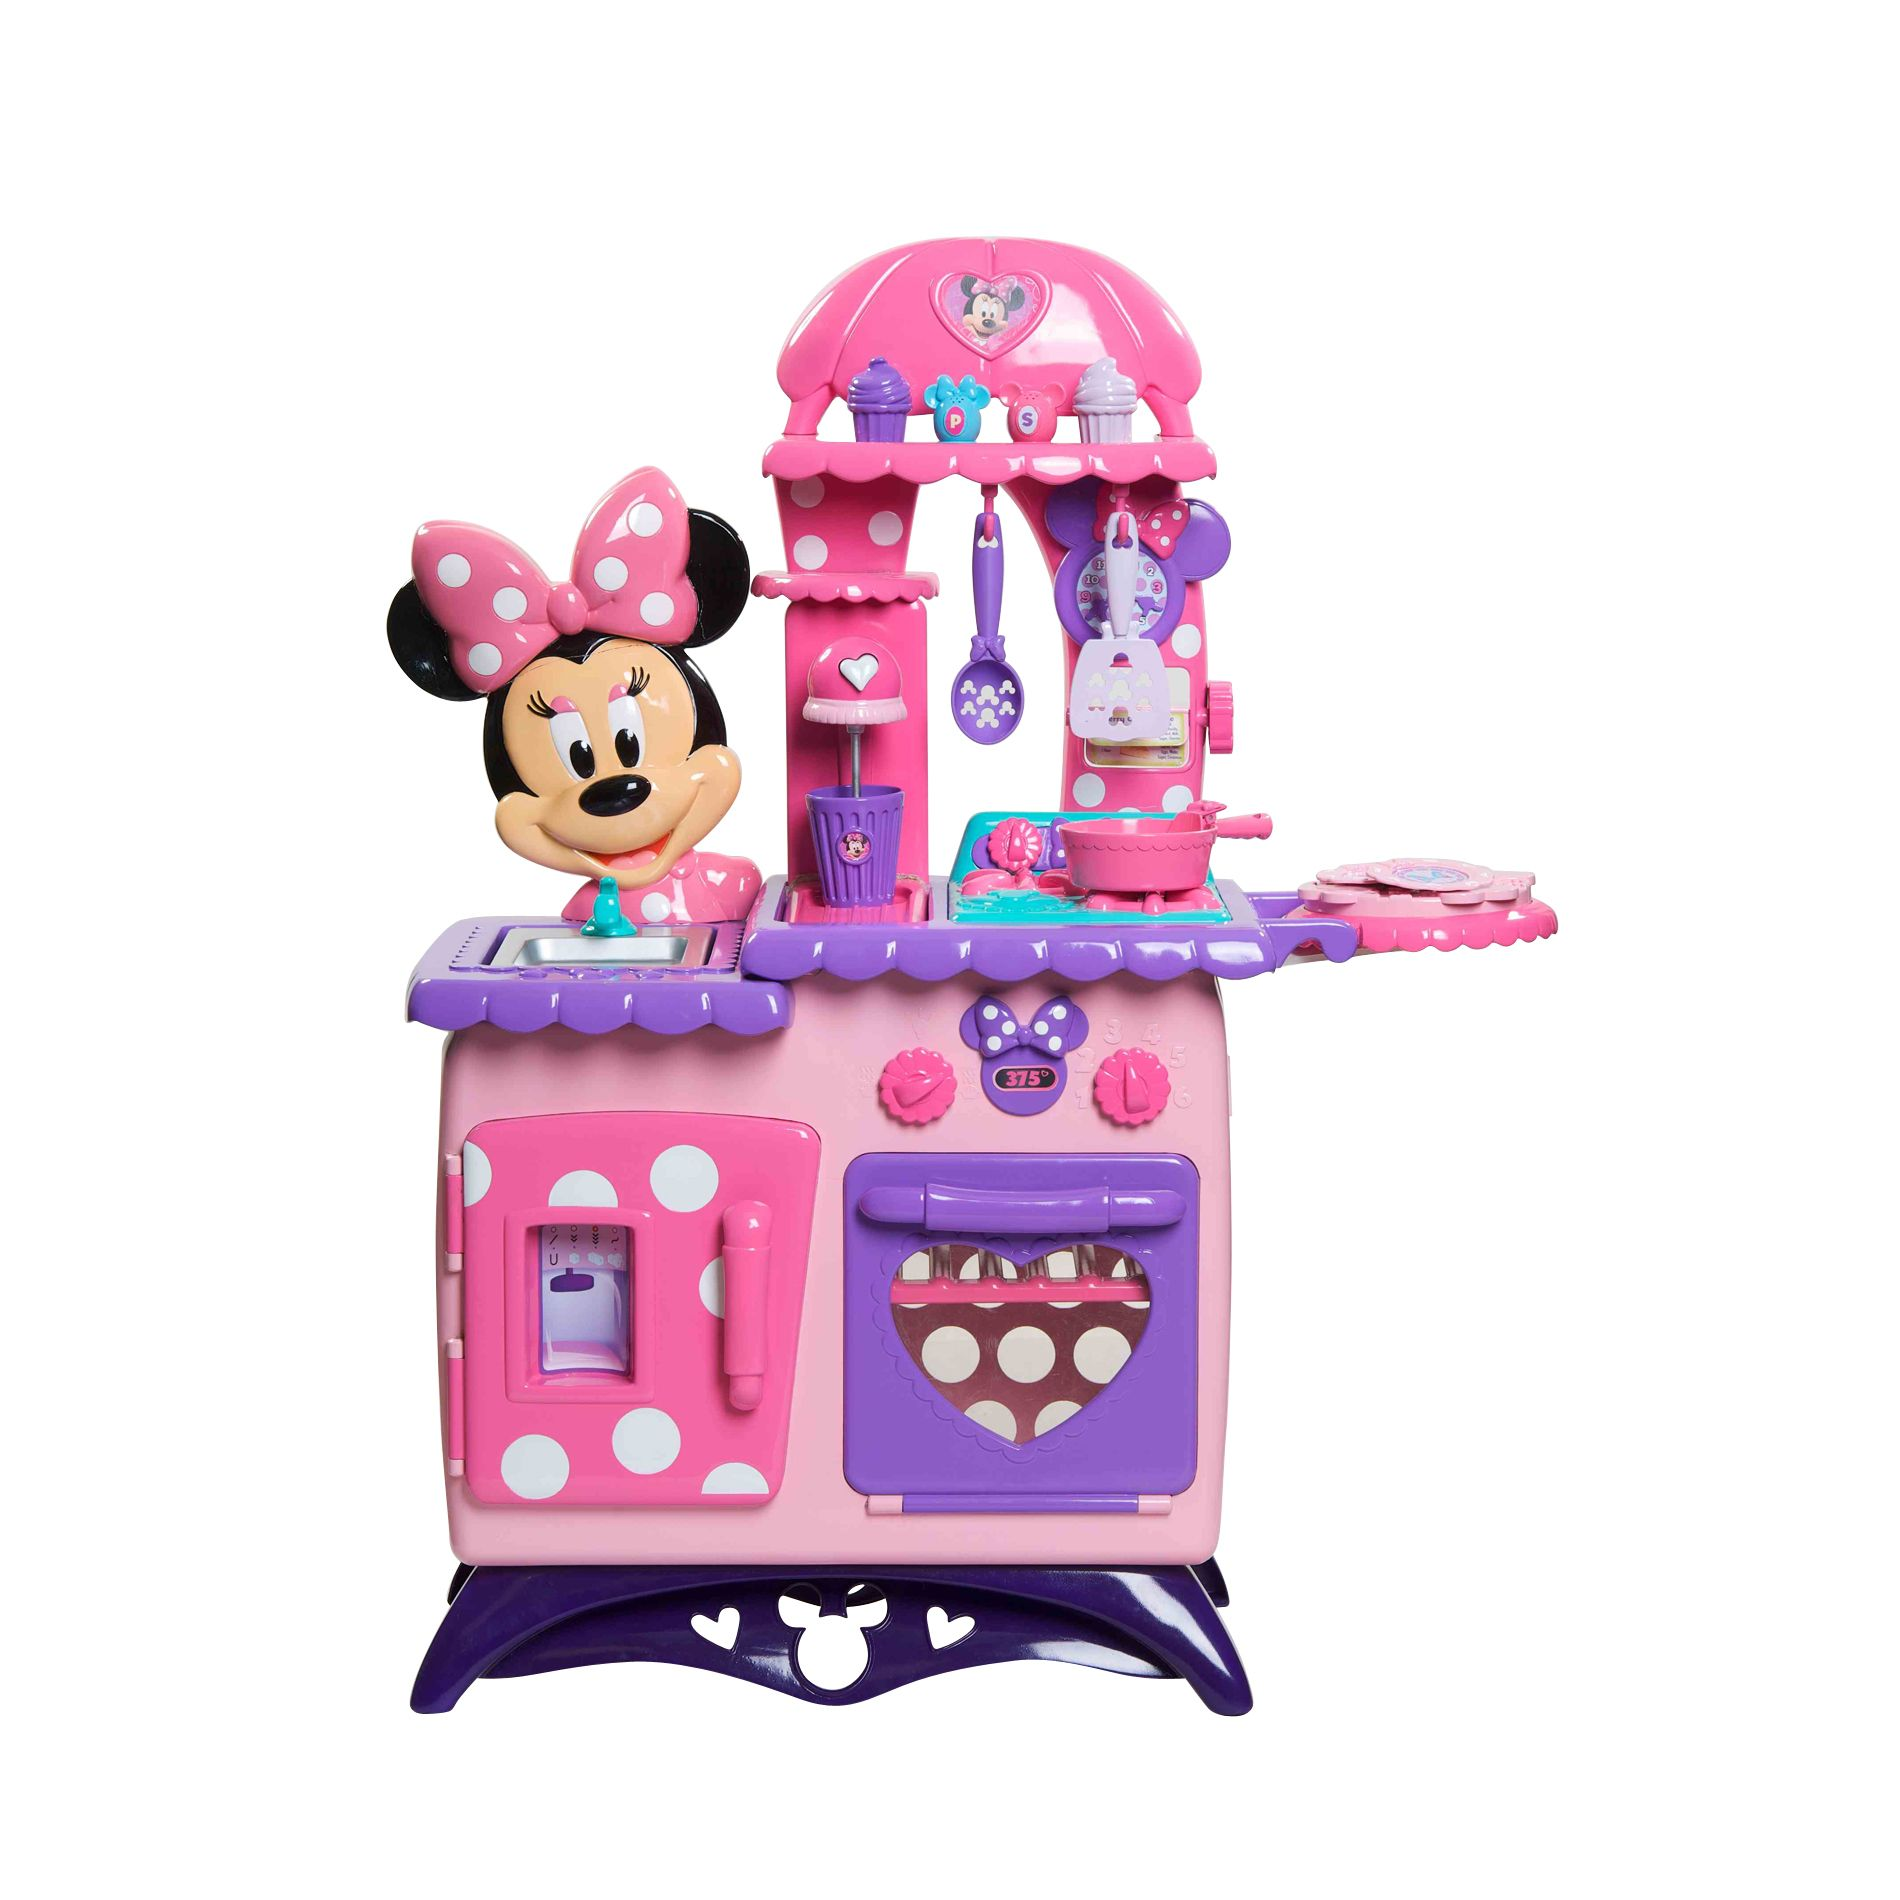 UPC 886144880018  Minnie Mouse Disney Minnie Kitchen  recaro north  upcitemdbcom